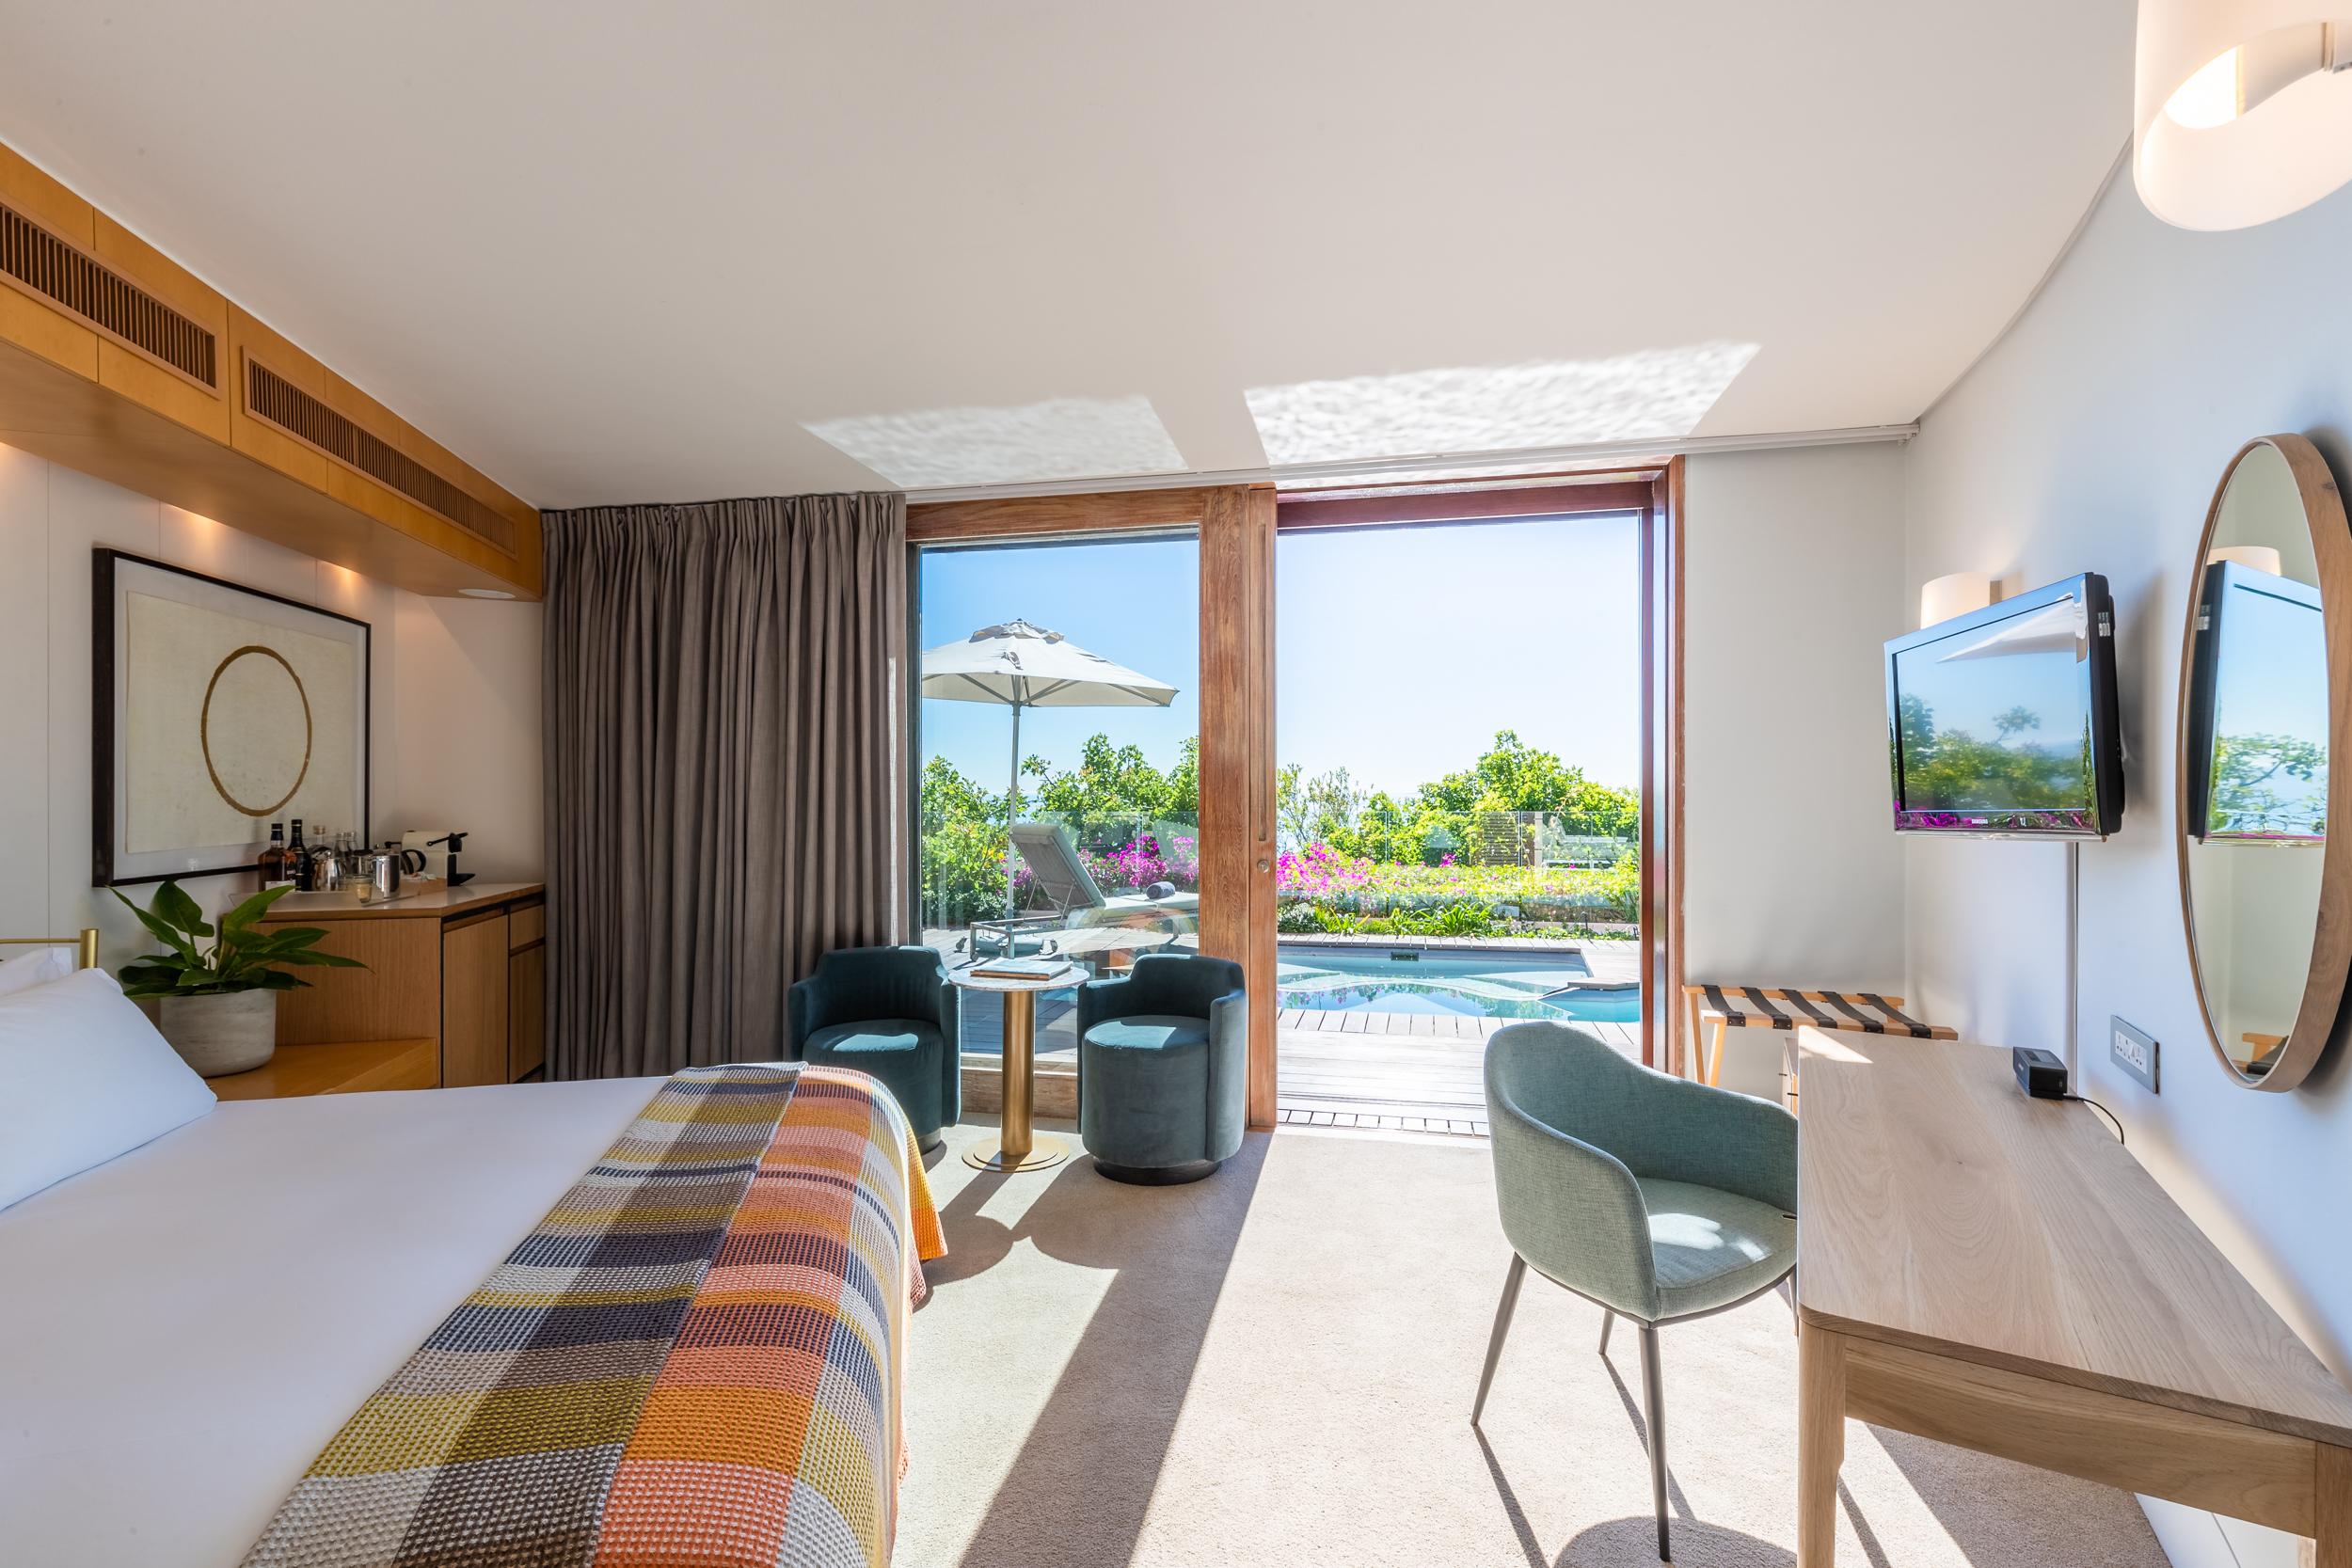 EH - Villa One - Spa Pool Room - 2500px.jpg